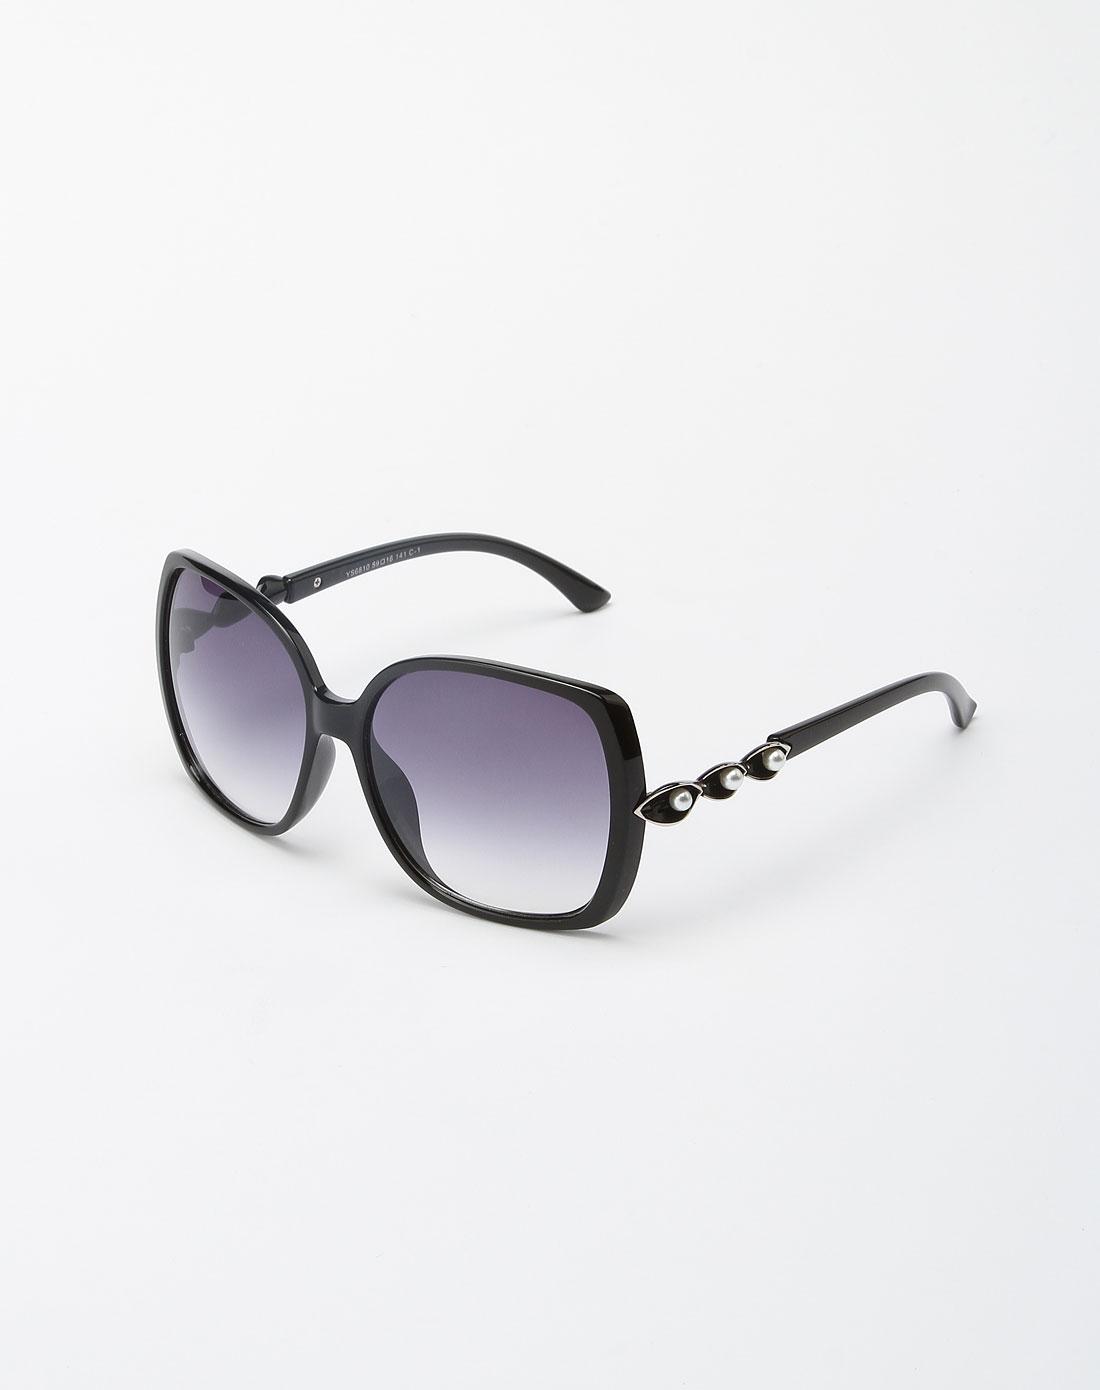 bailewei配件专场黑色欧式复古太阳眼镜7blw